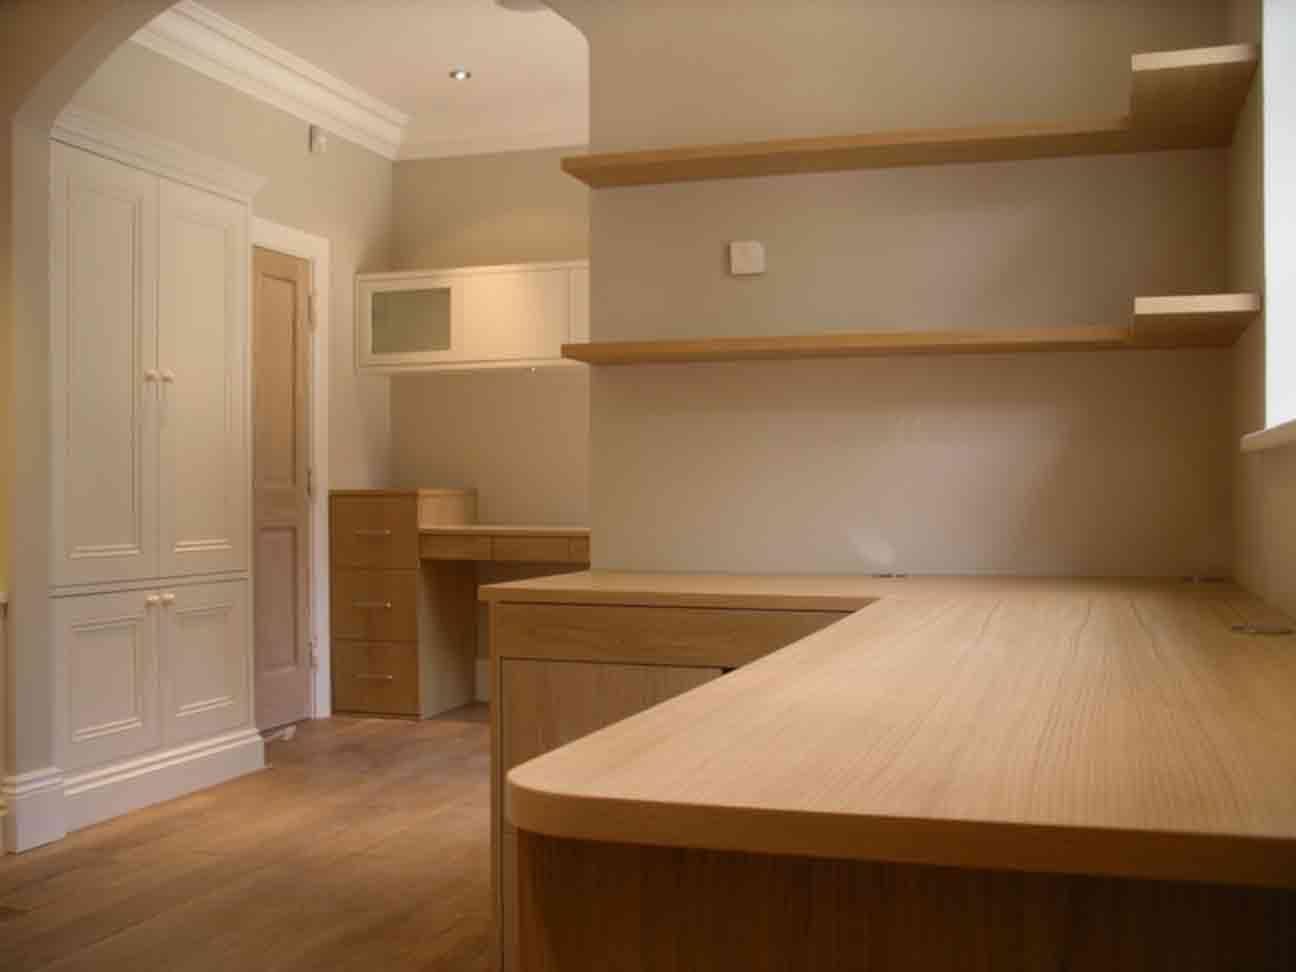 Bespoke Studies Peter Henderson Furniture Brighton Uk Intended For Bespoke Built In Furniture (#10 of 15)